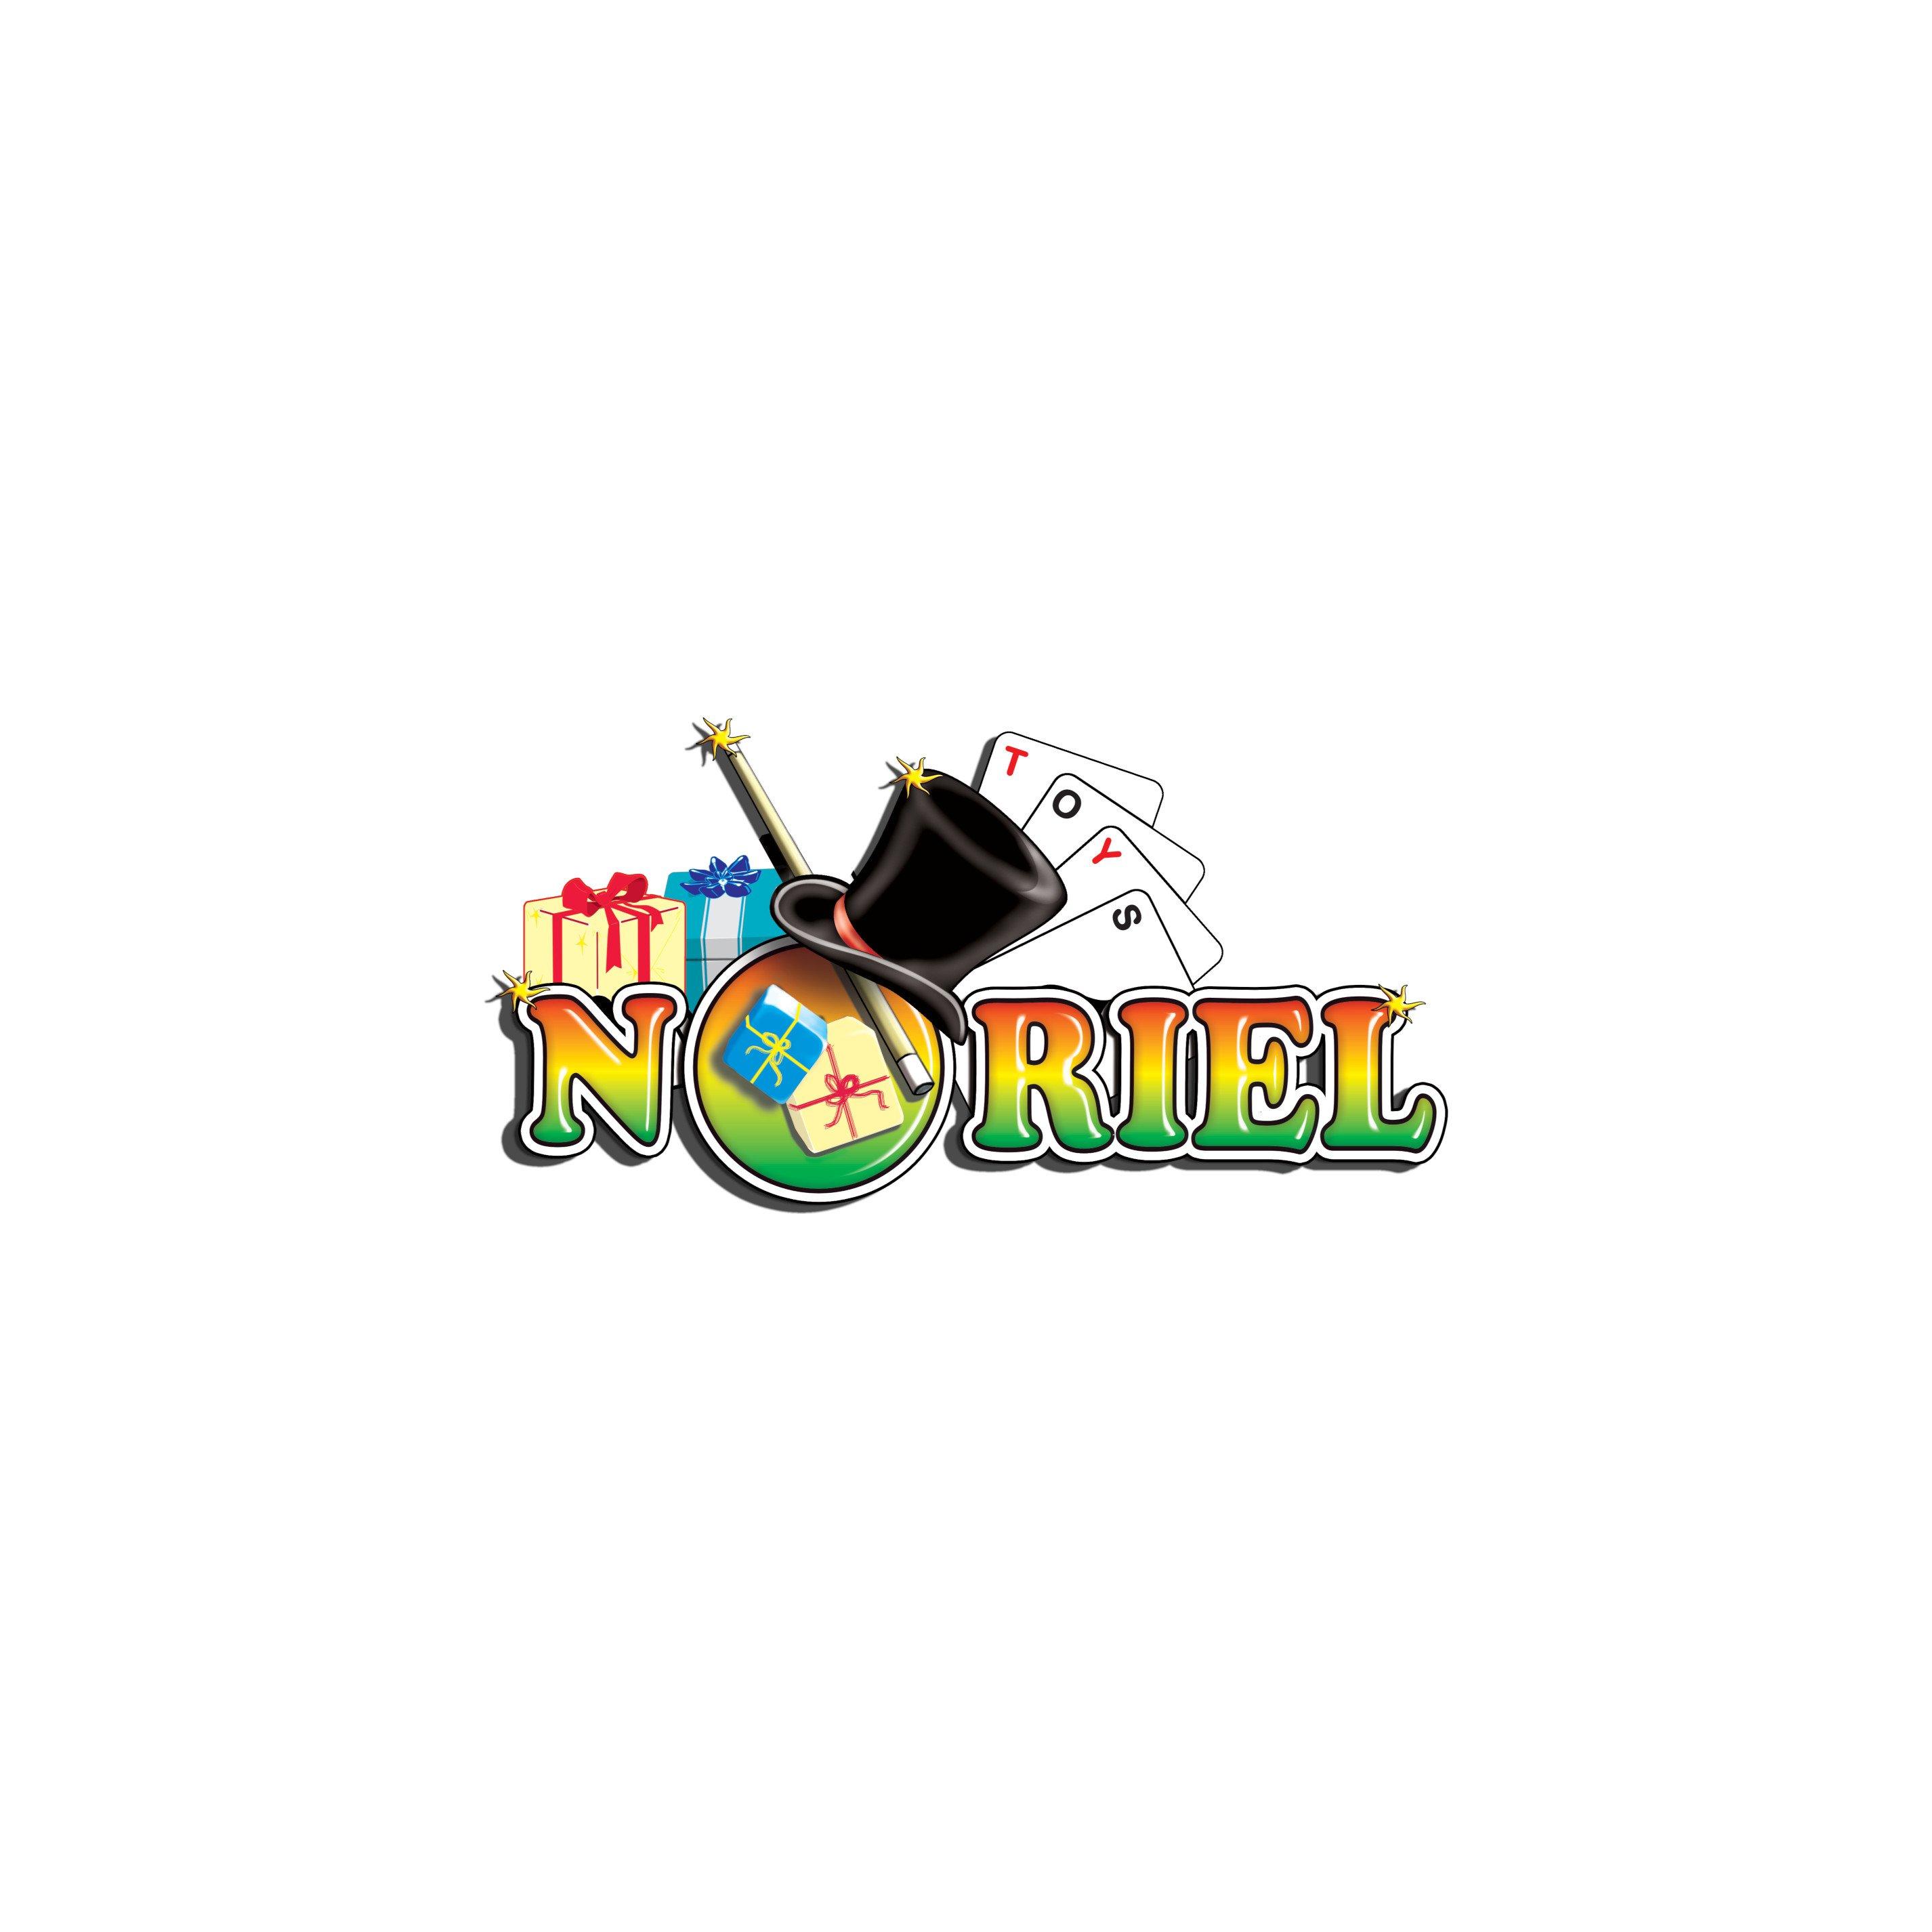 Figurina My Little Pony Friends - All About Rainbow Dash, 7.6 cm